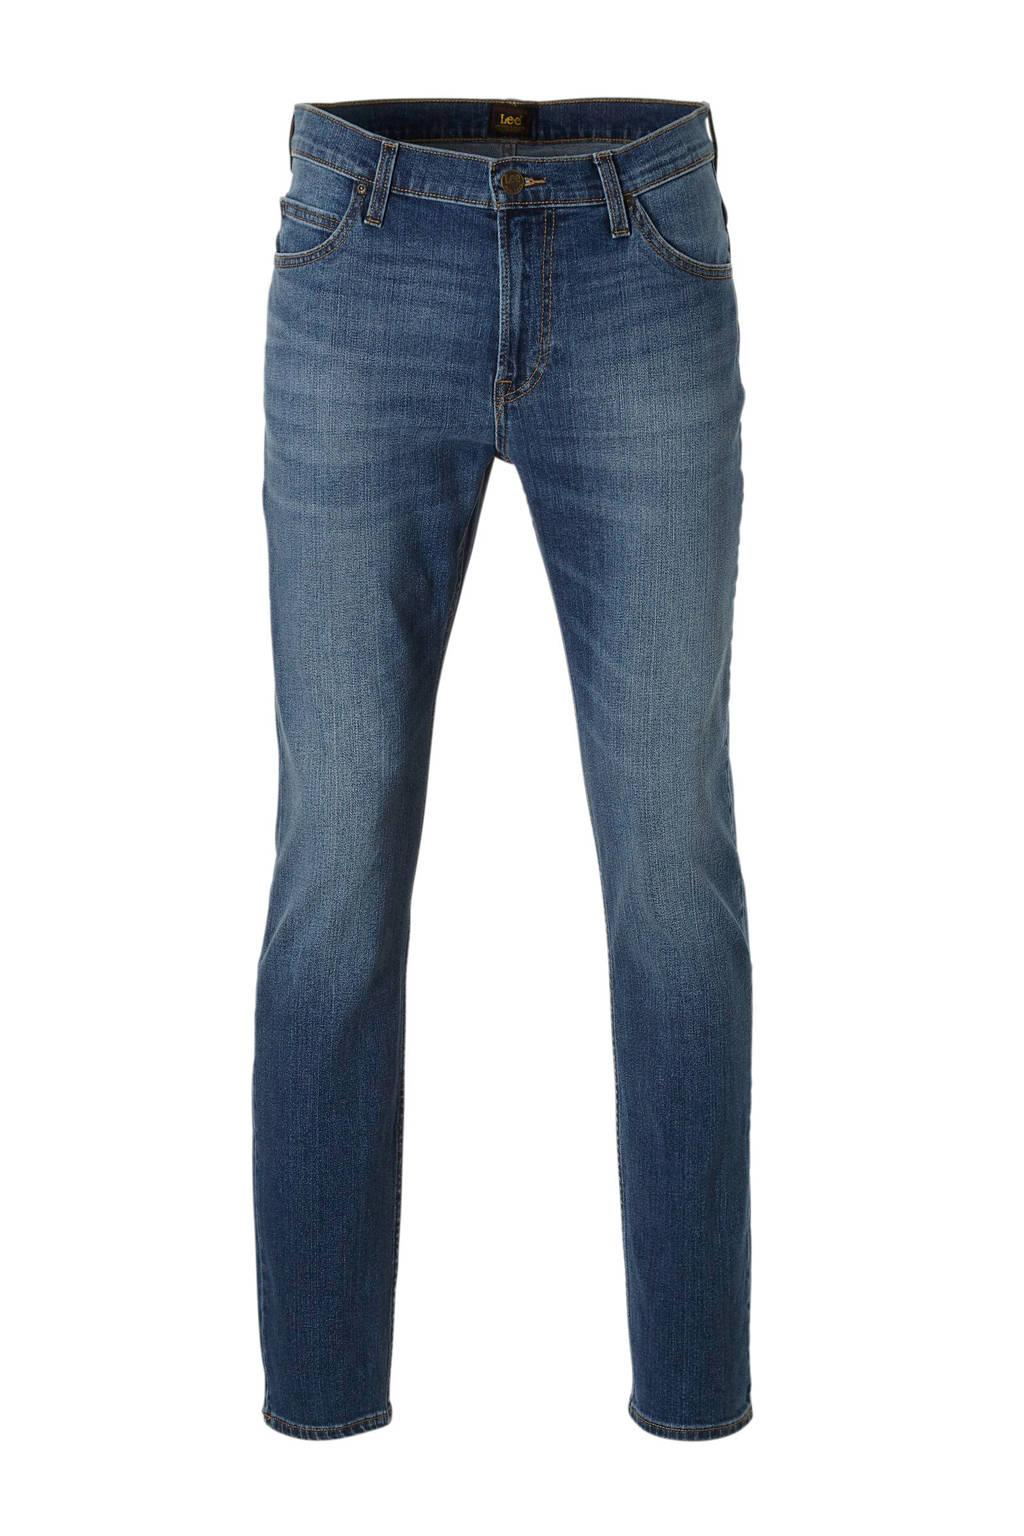 Lee slim fit jeans Rider dxsx broken blue, DXSX BROKEN BLUE